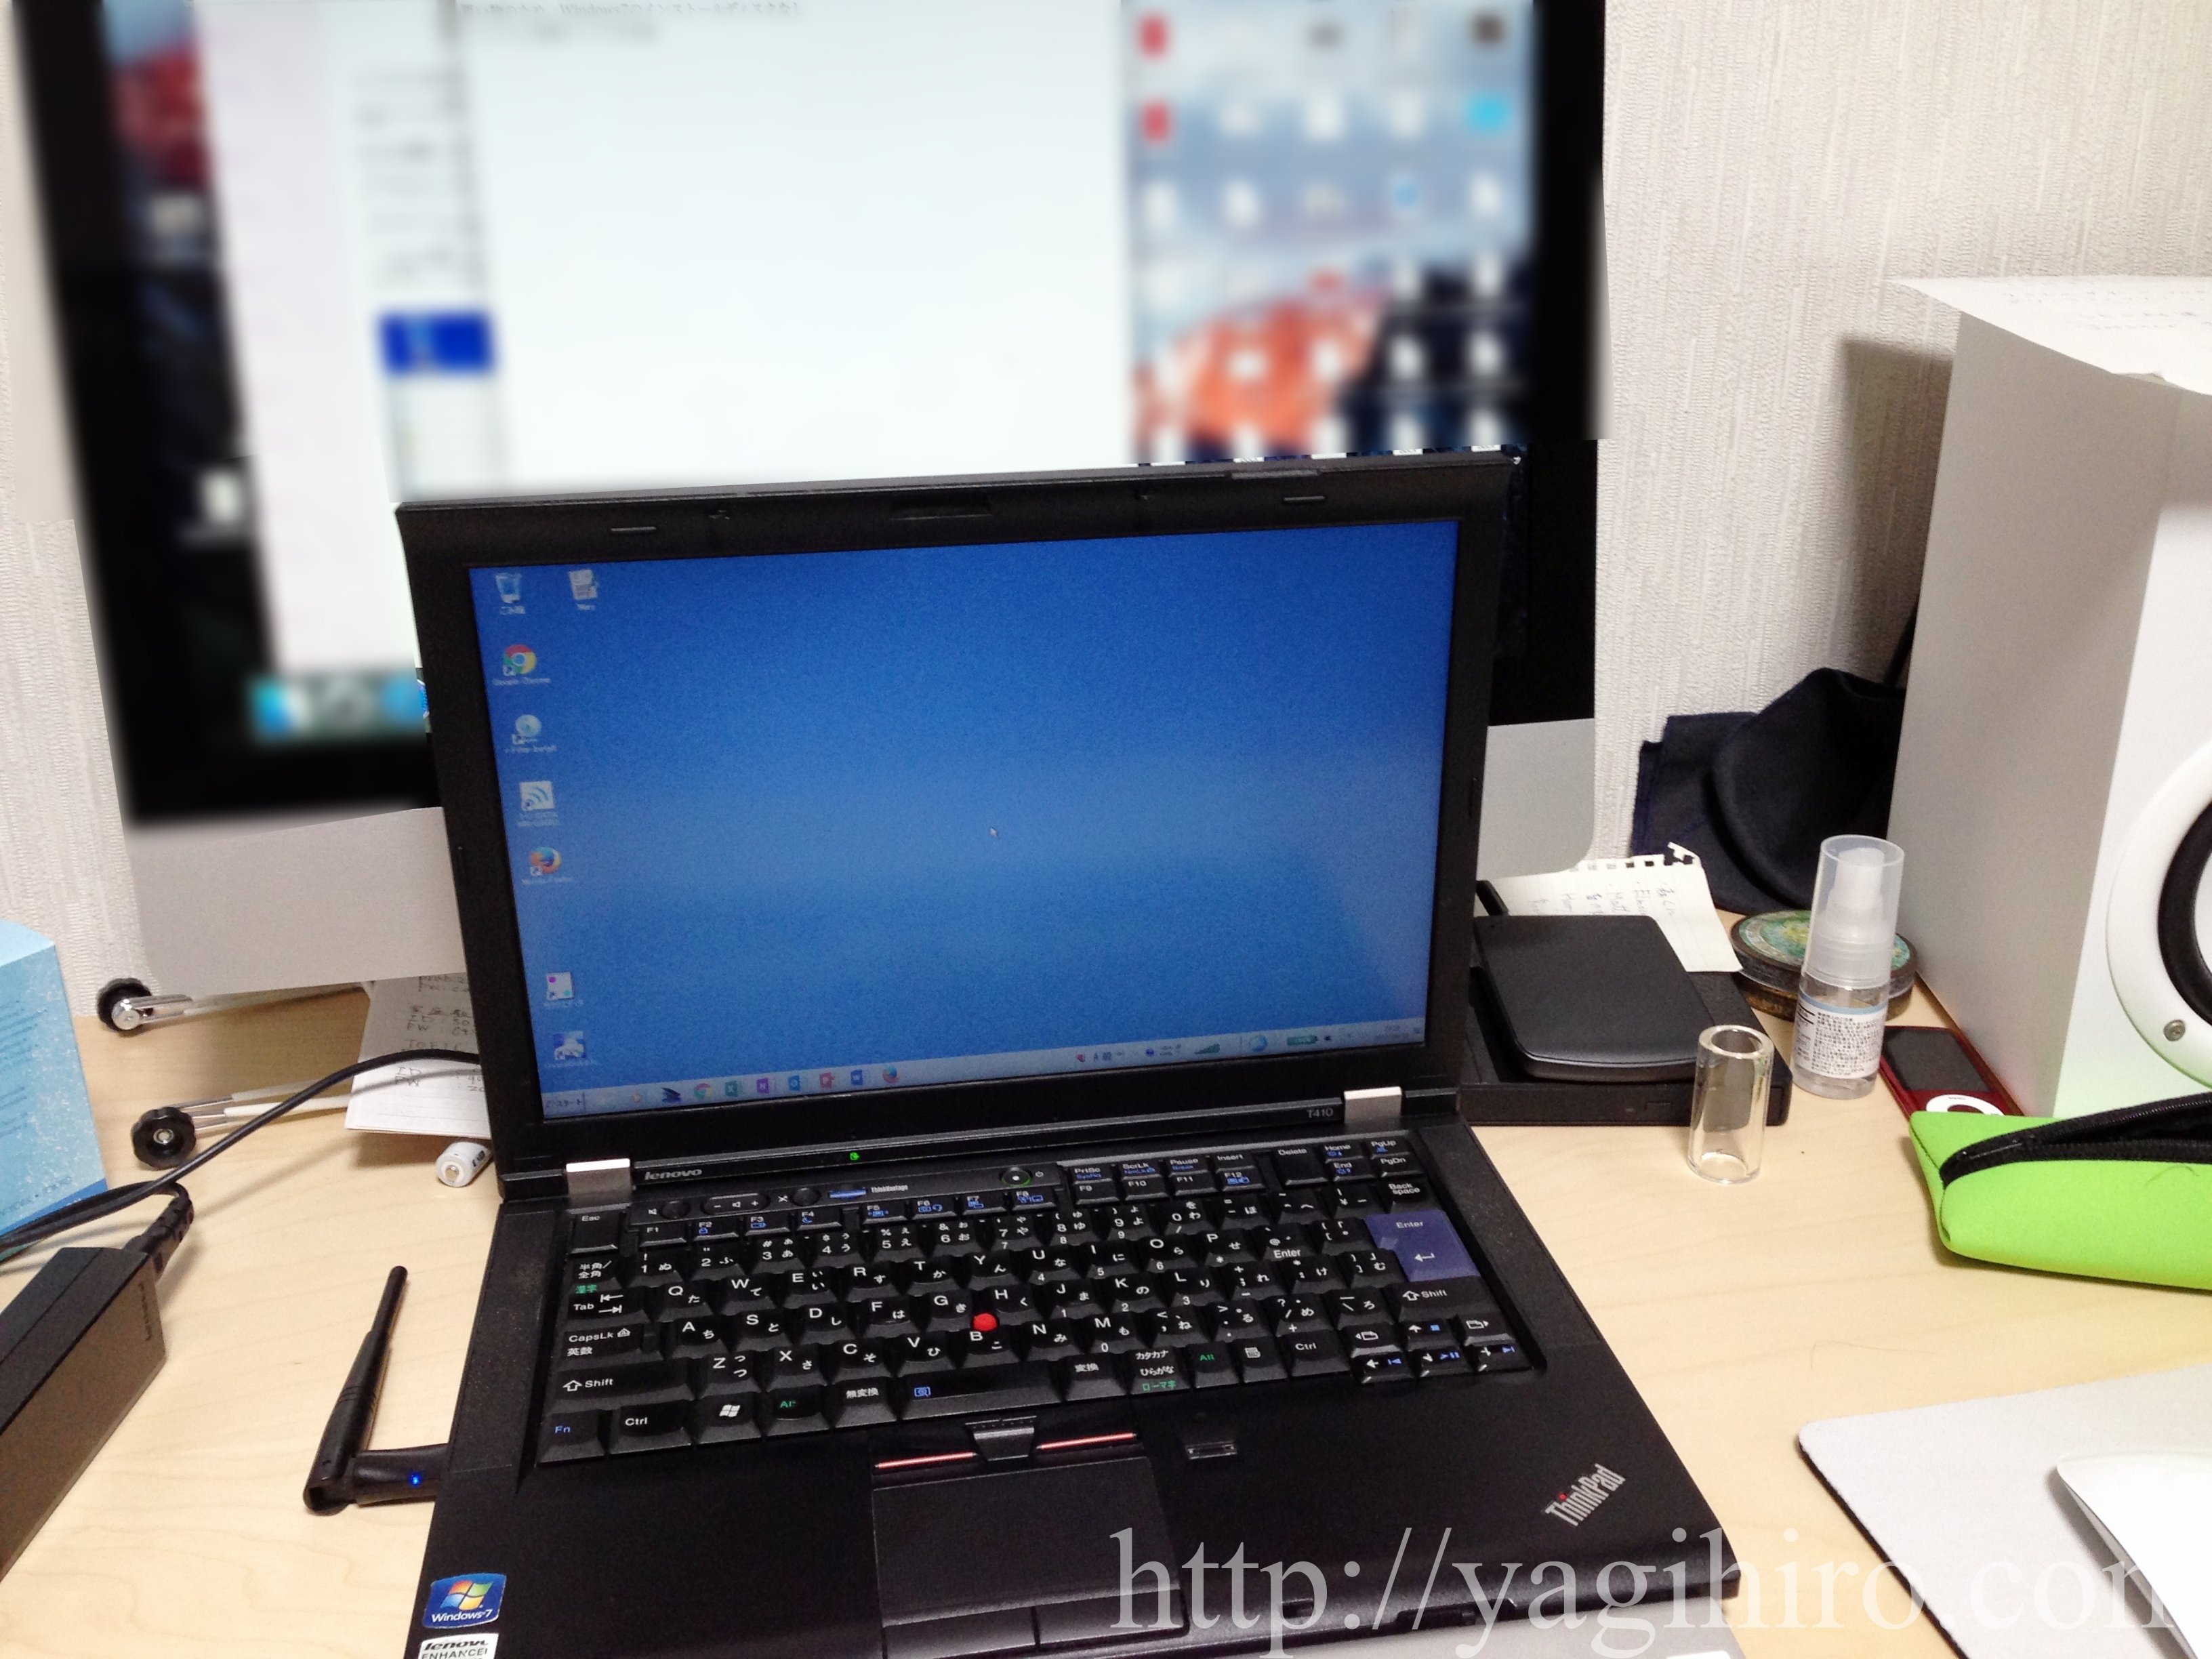 Windows7を立ち上げた状態のT410